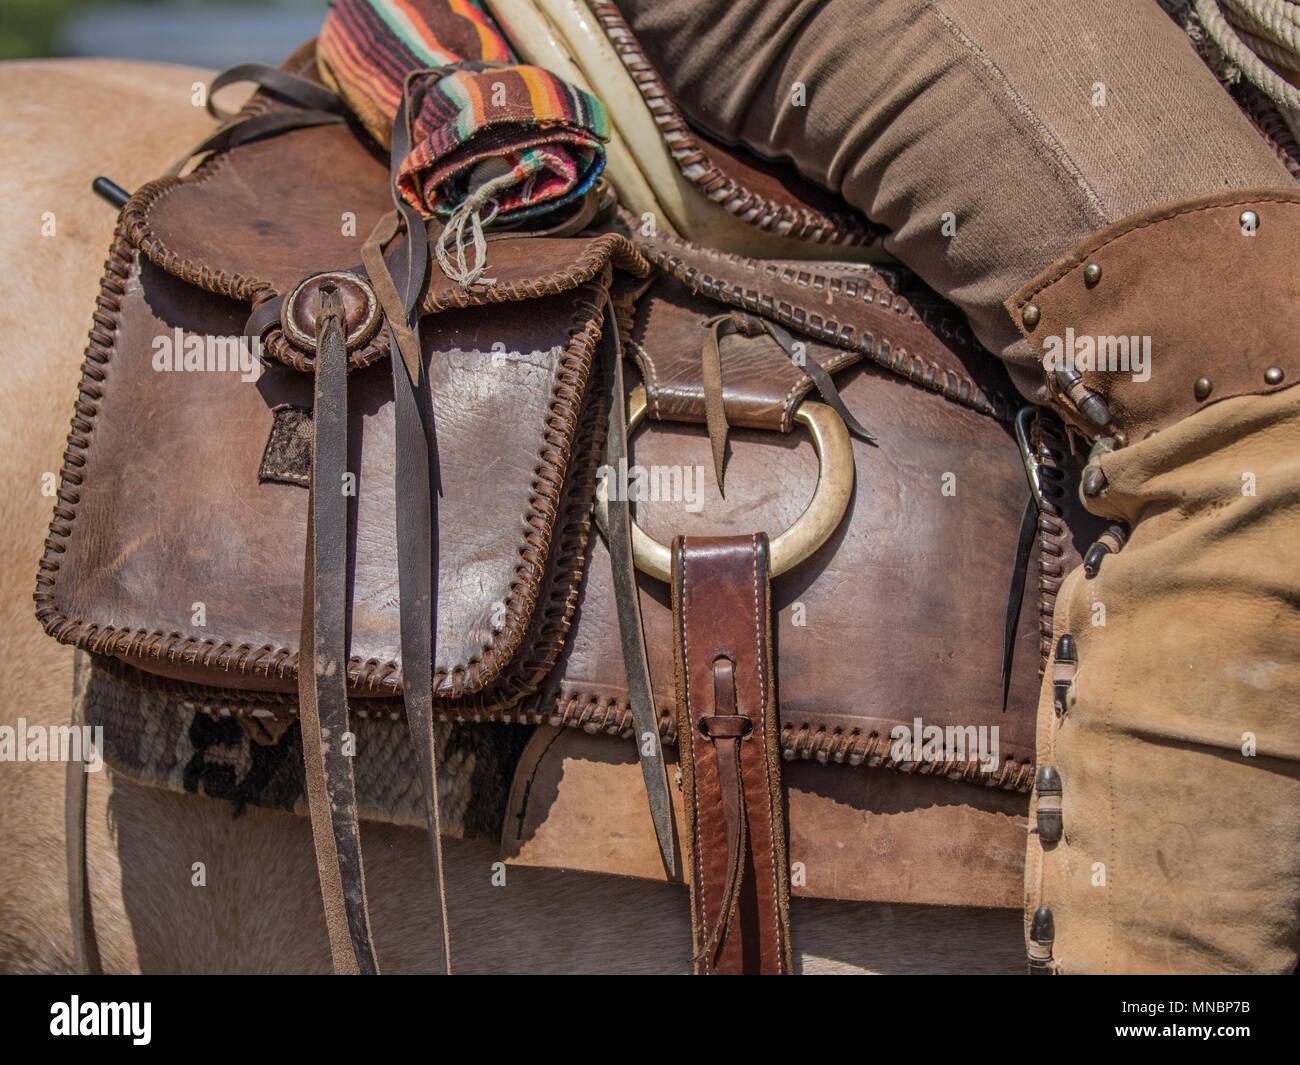 Traditional Cowboy Vaquero Saddle Rig Stock Photo: 185270383